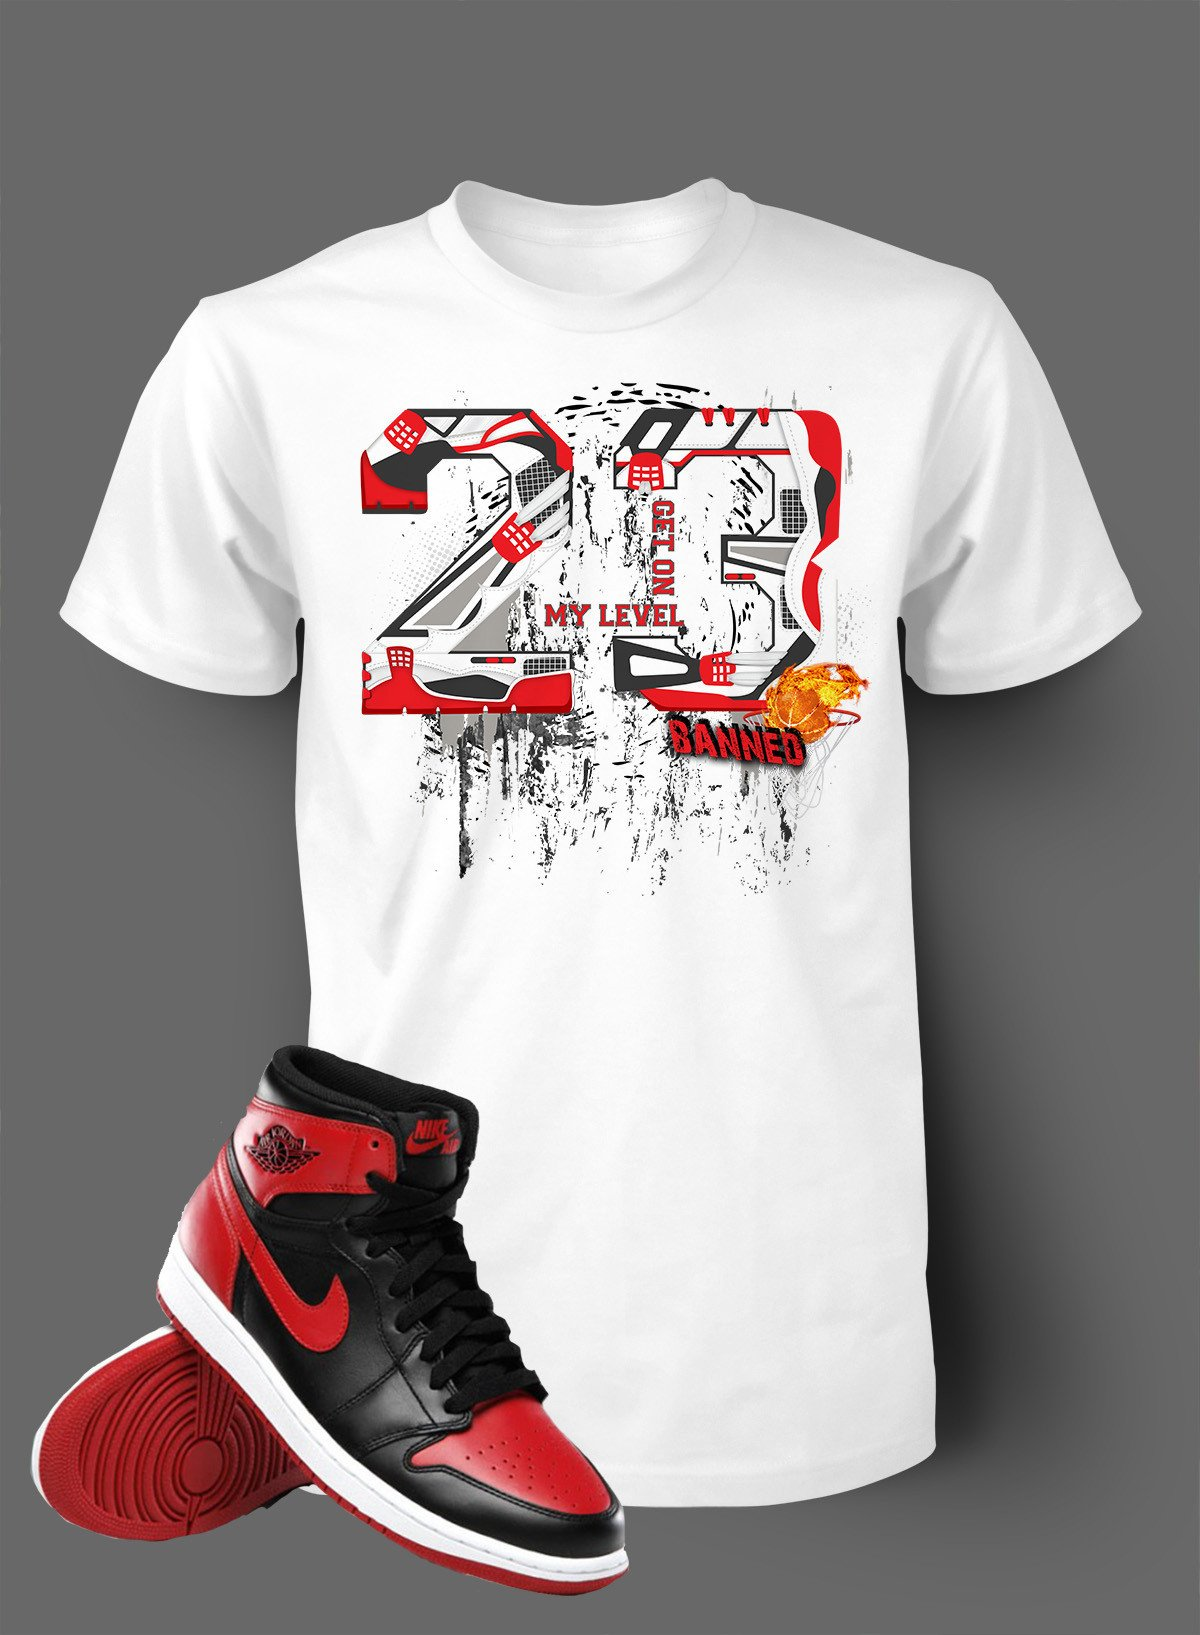 ac429c140550e2 Graphic Shattered T Shirt To Match Retro Air Jordan 1 Banned Shoe ...